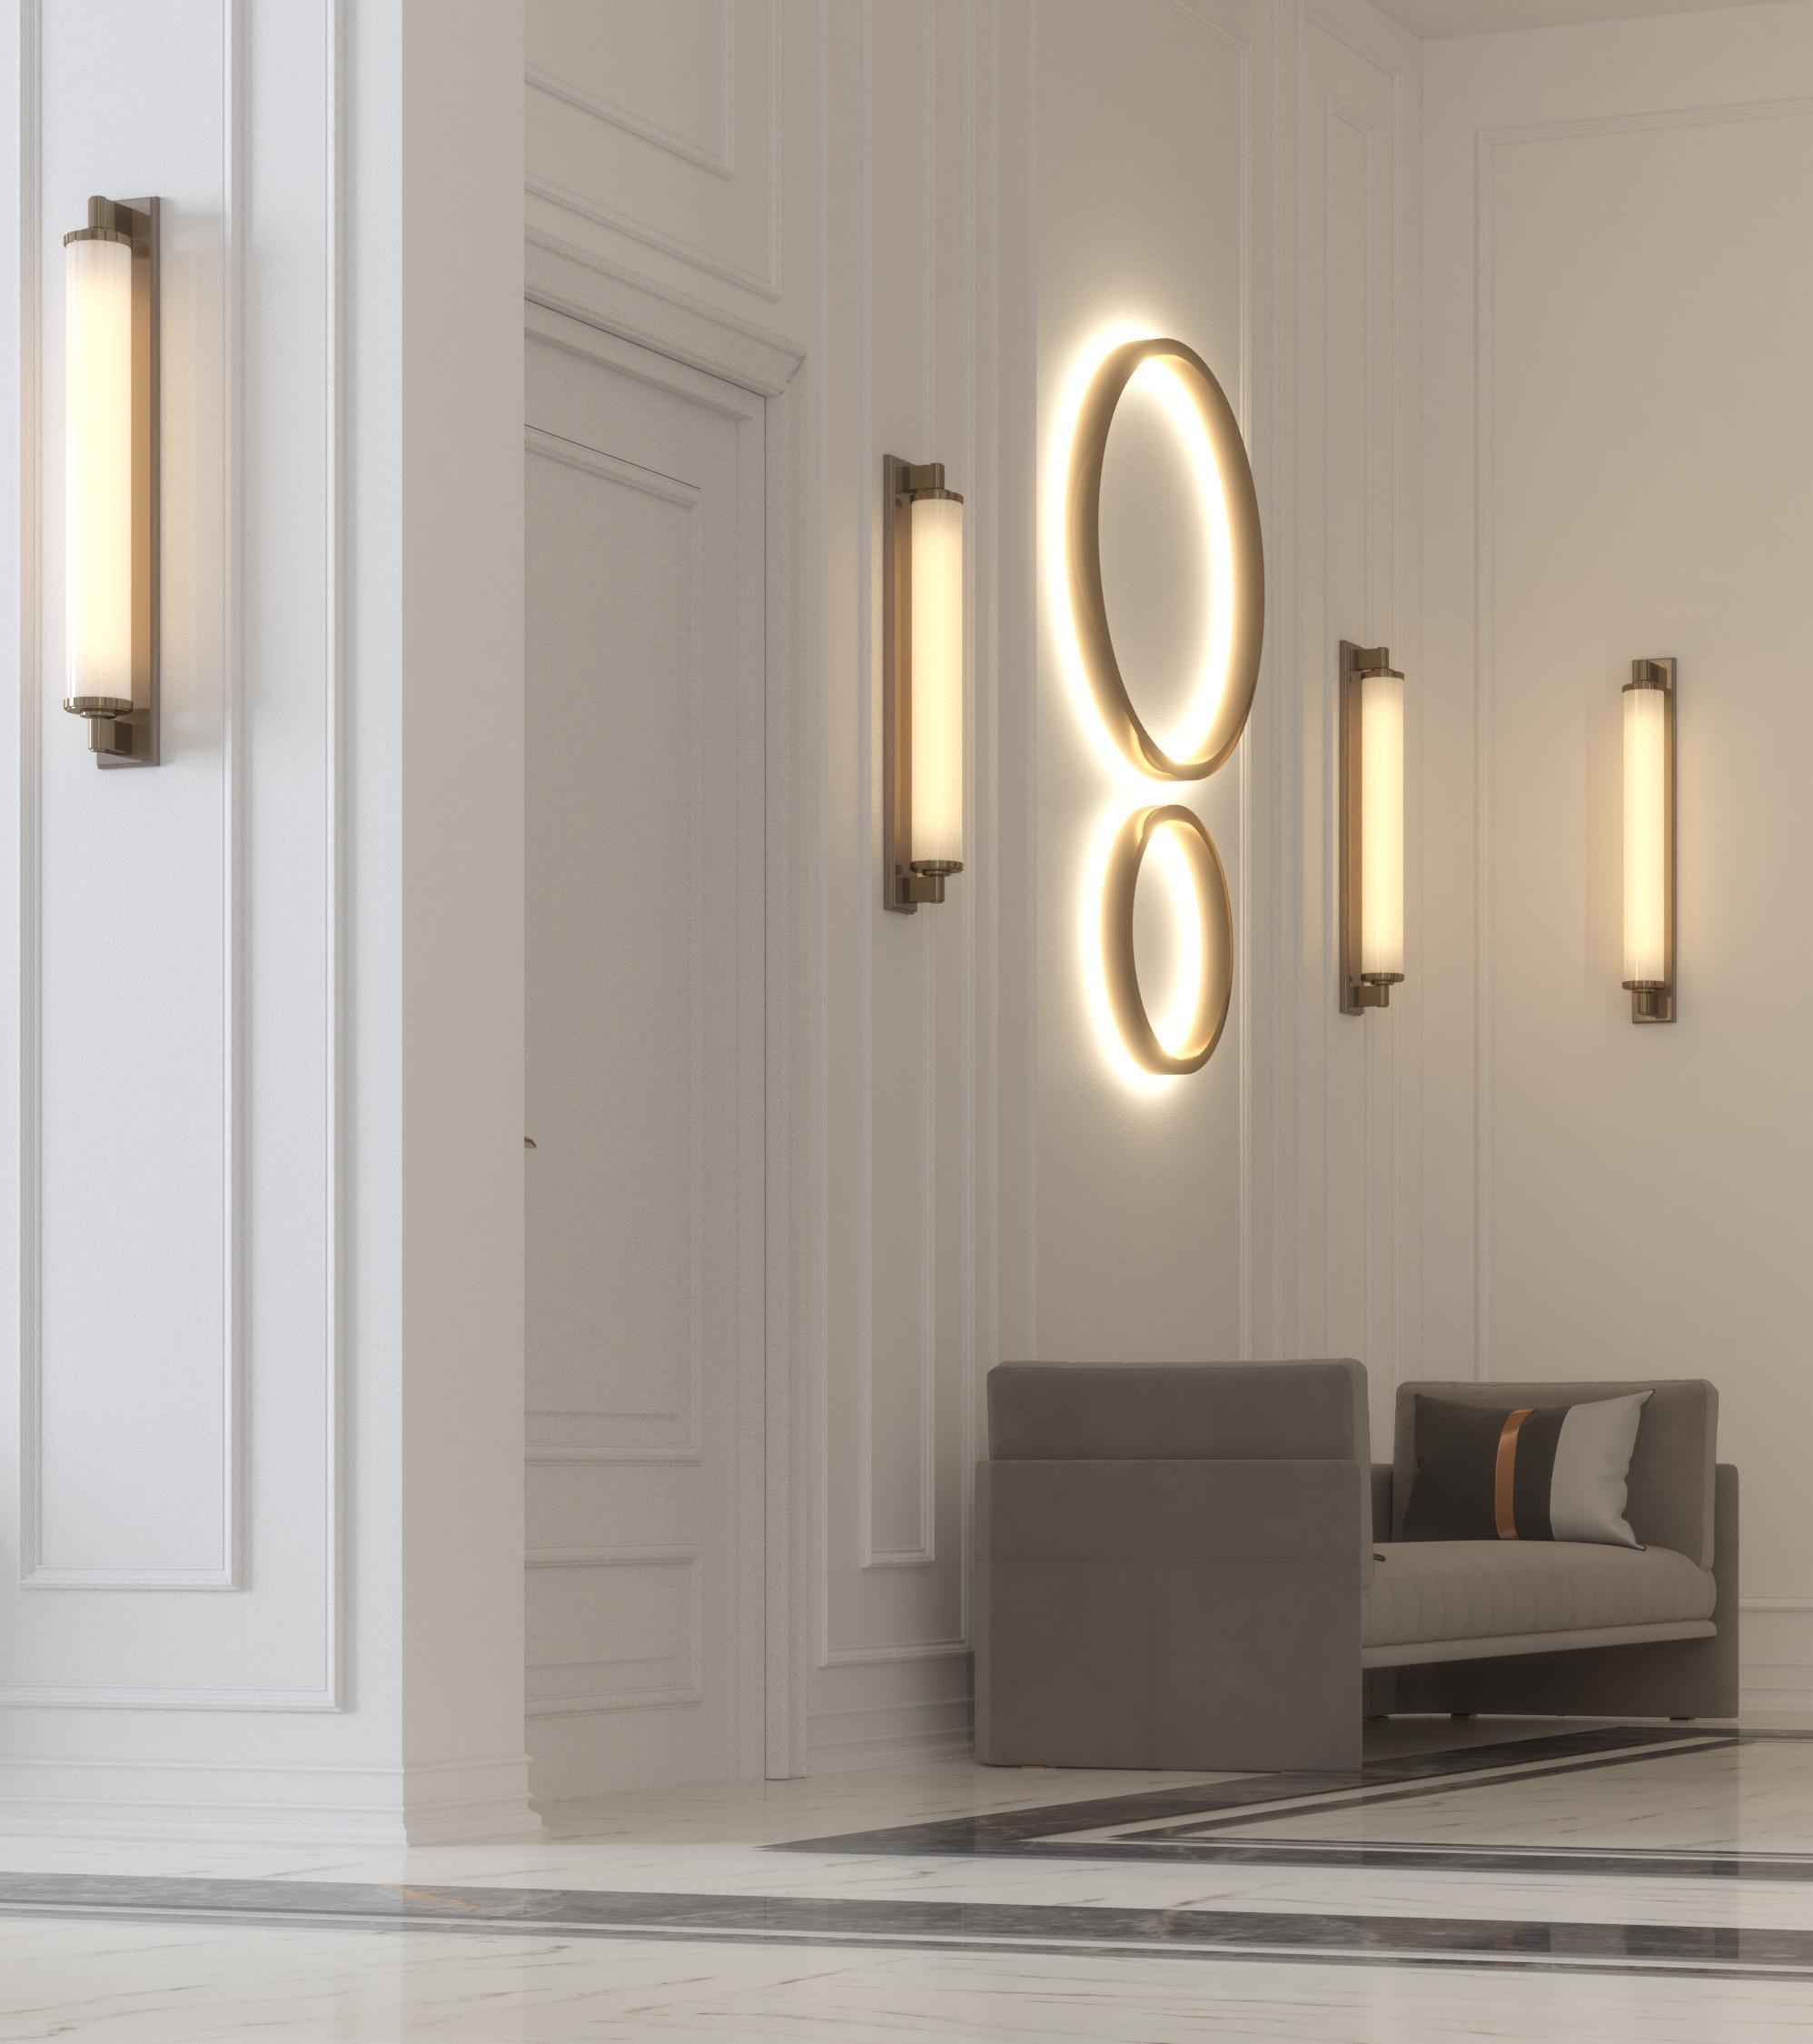 corridor wall design - light work -